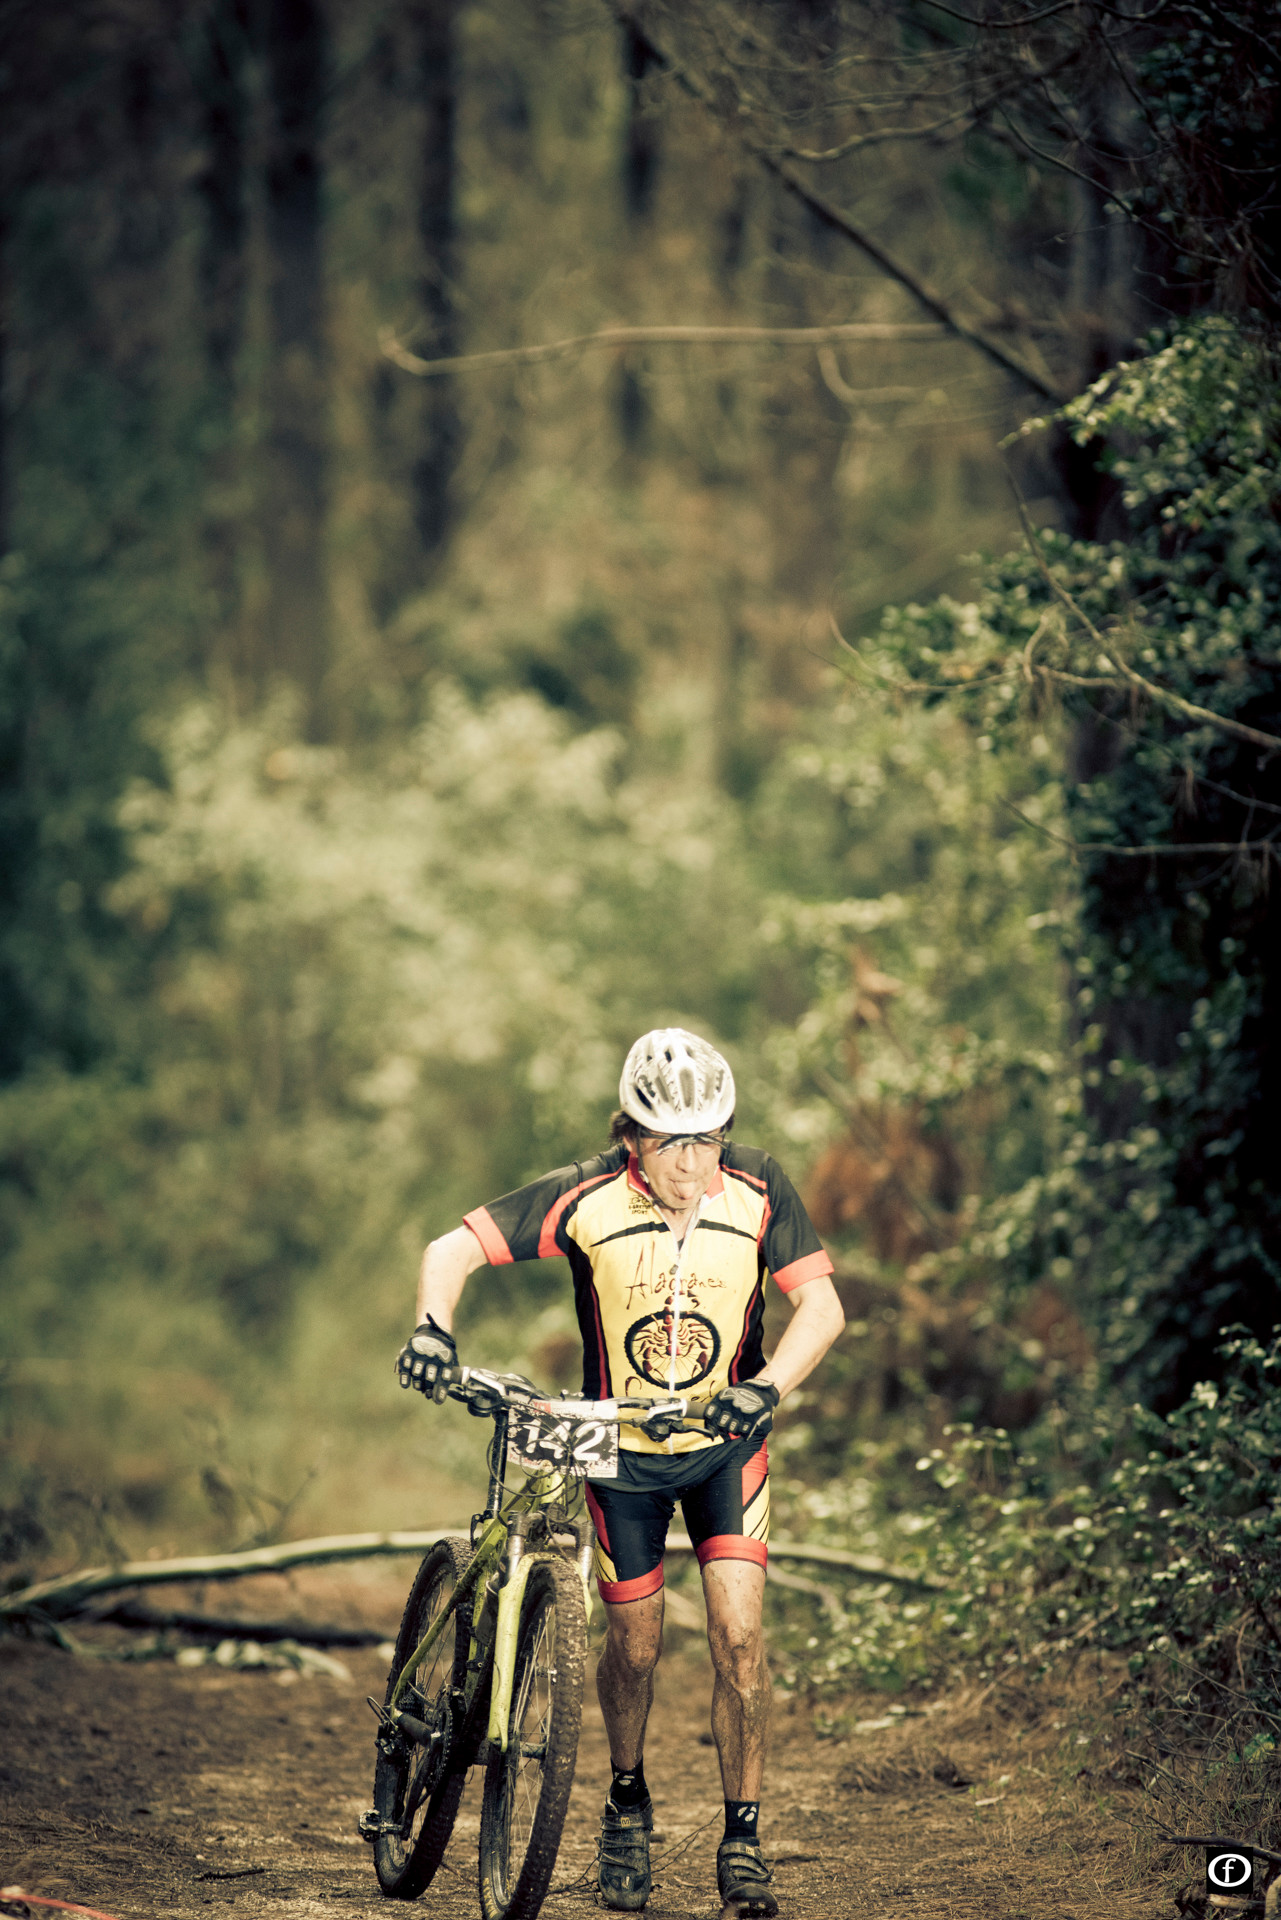 2015-05-17-Ciclismo Enduro-69.jpg